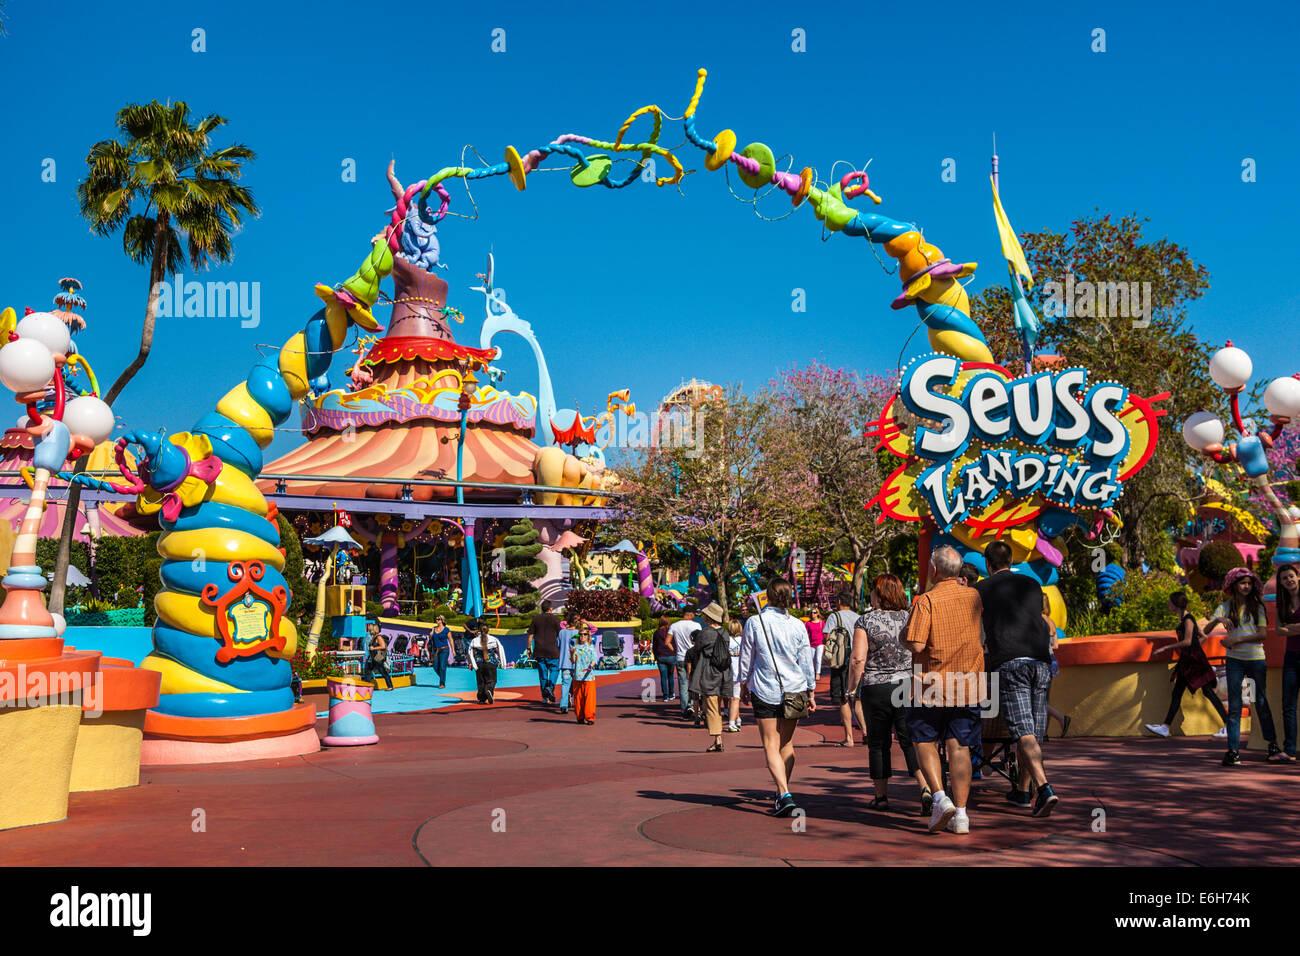 Universal Island Of Adventure Or Universal Studios Florida